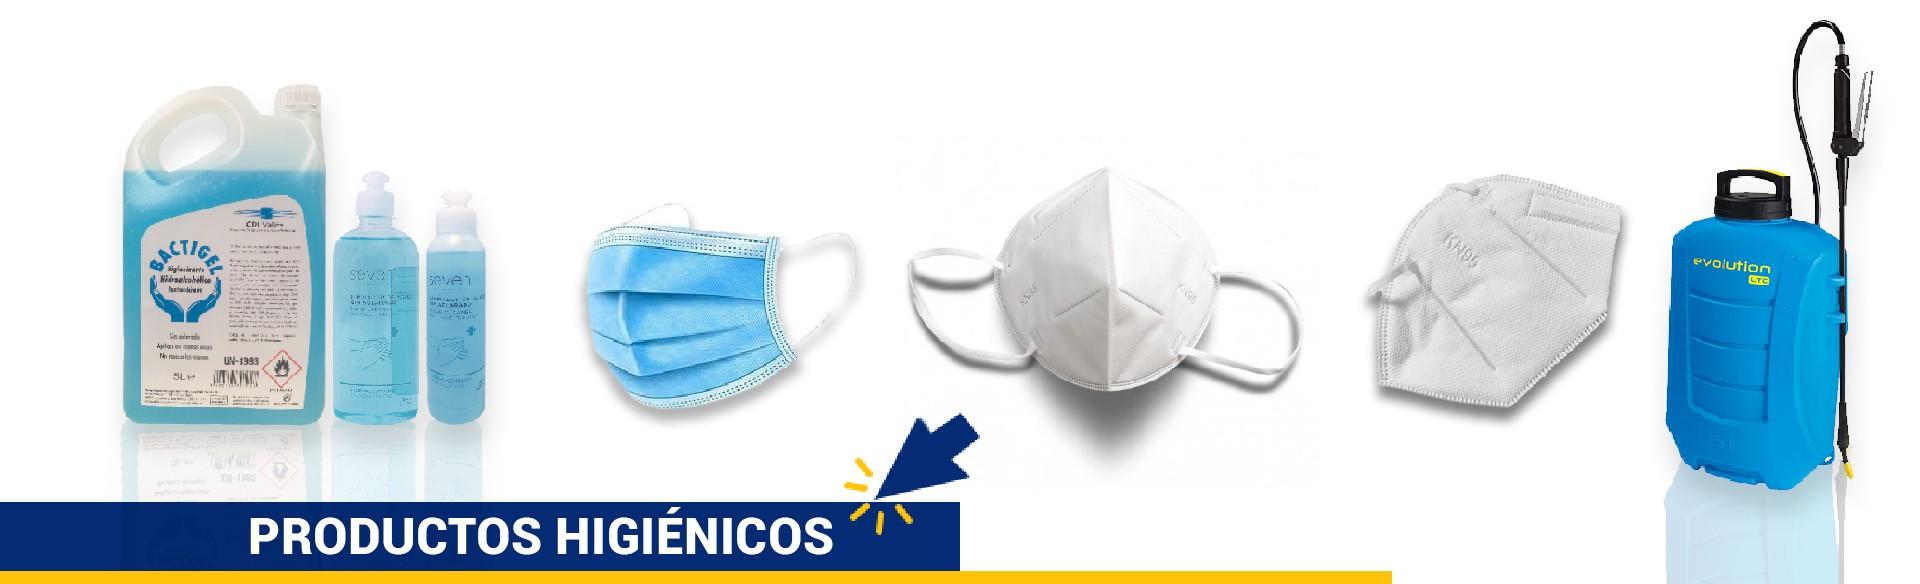 Productos Higiénicos